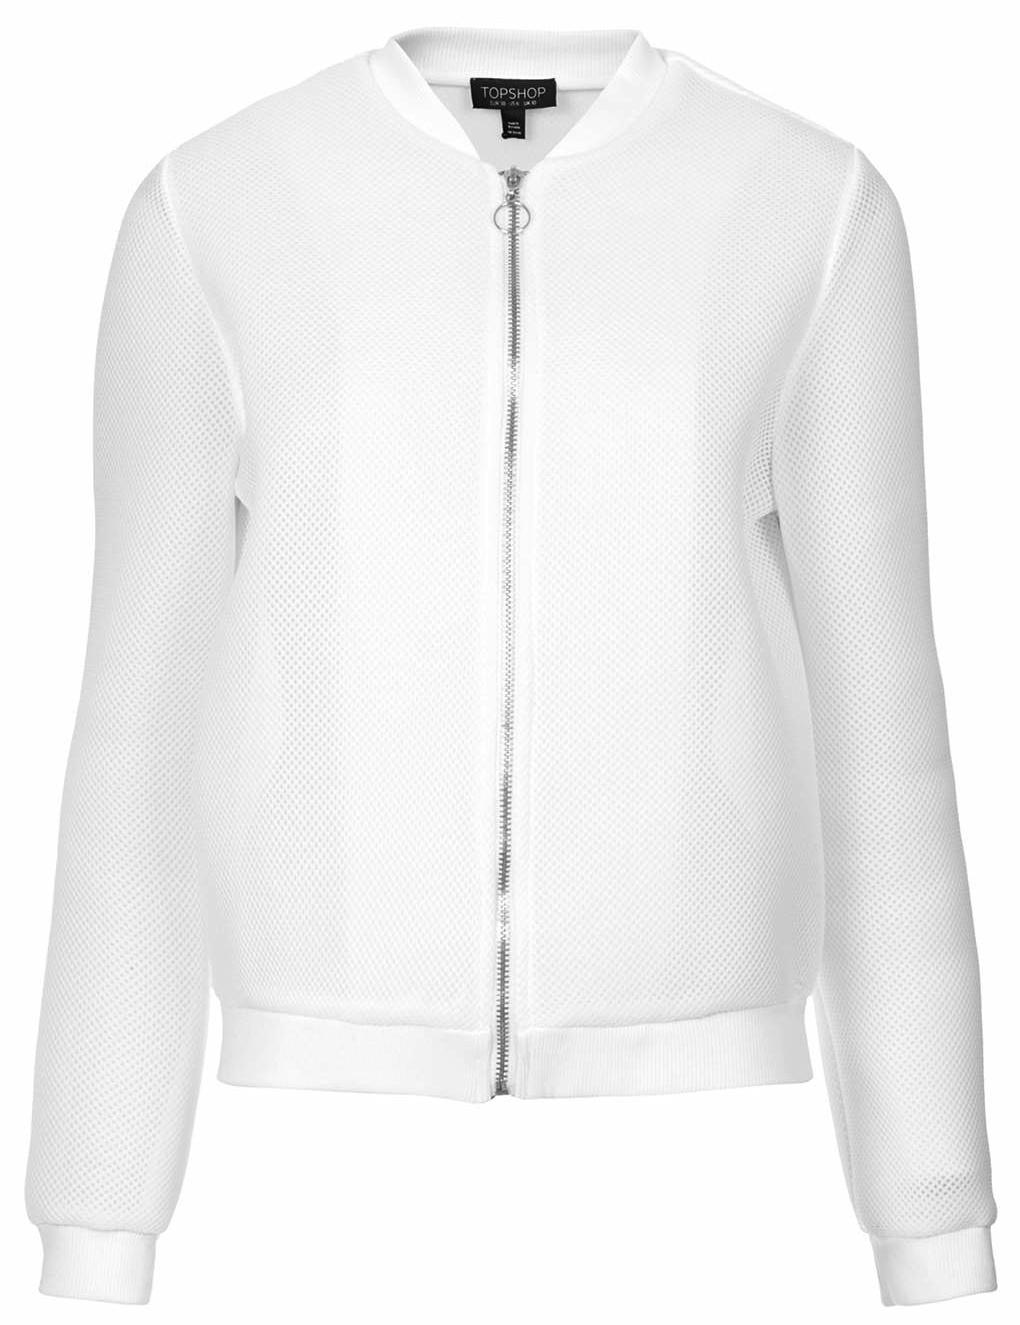 Topshop white airtex bomber jacket